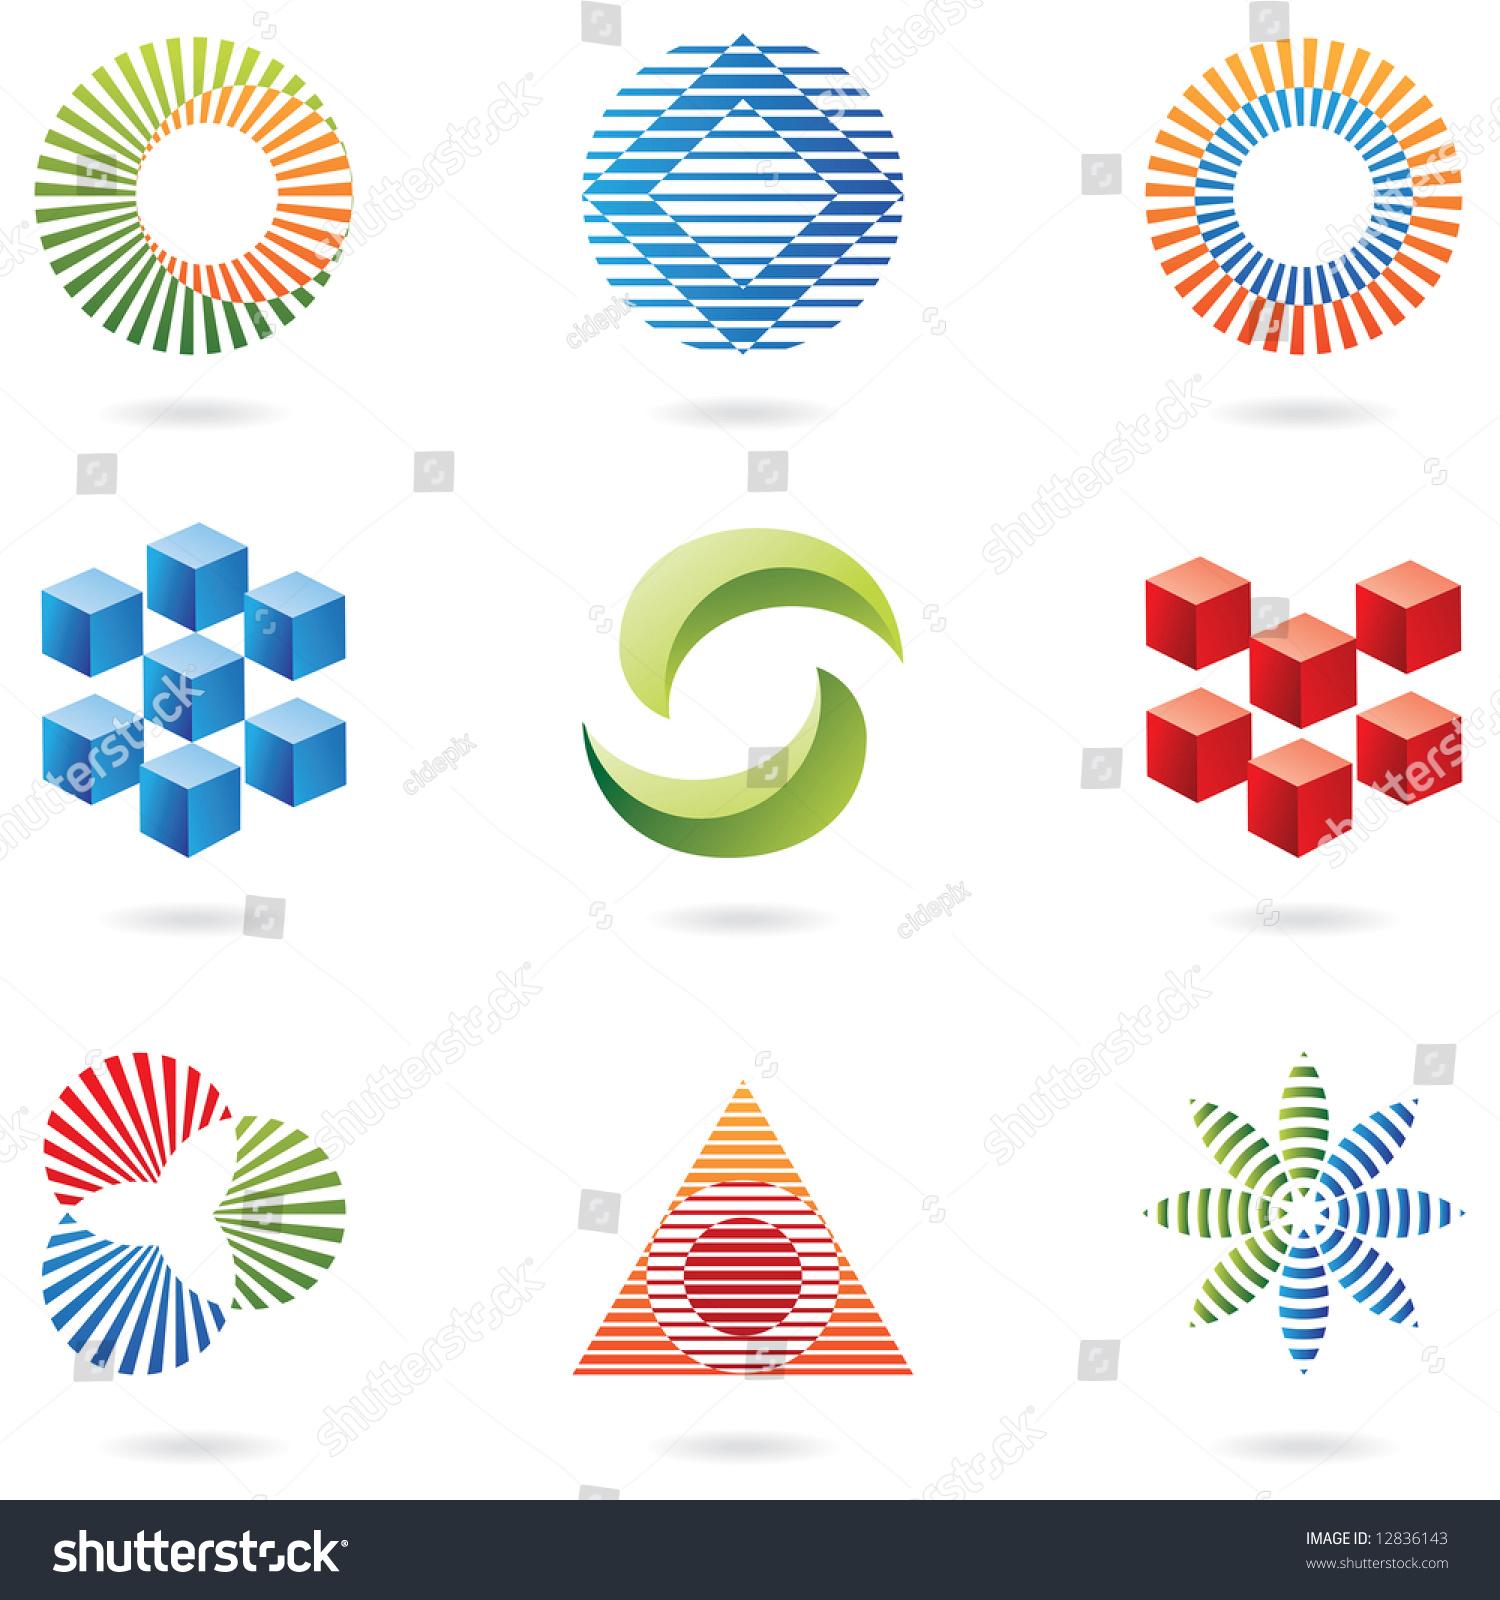 Graphic Design Elements Line : Logo shapes graphic design elements lines stock vector